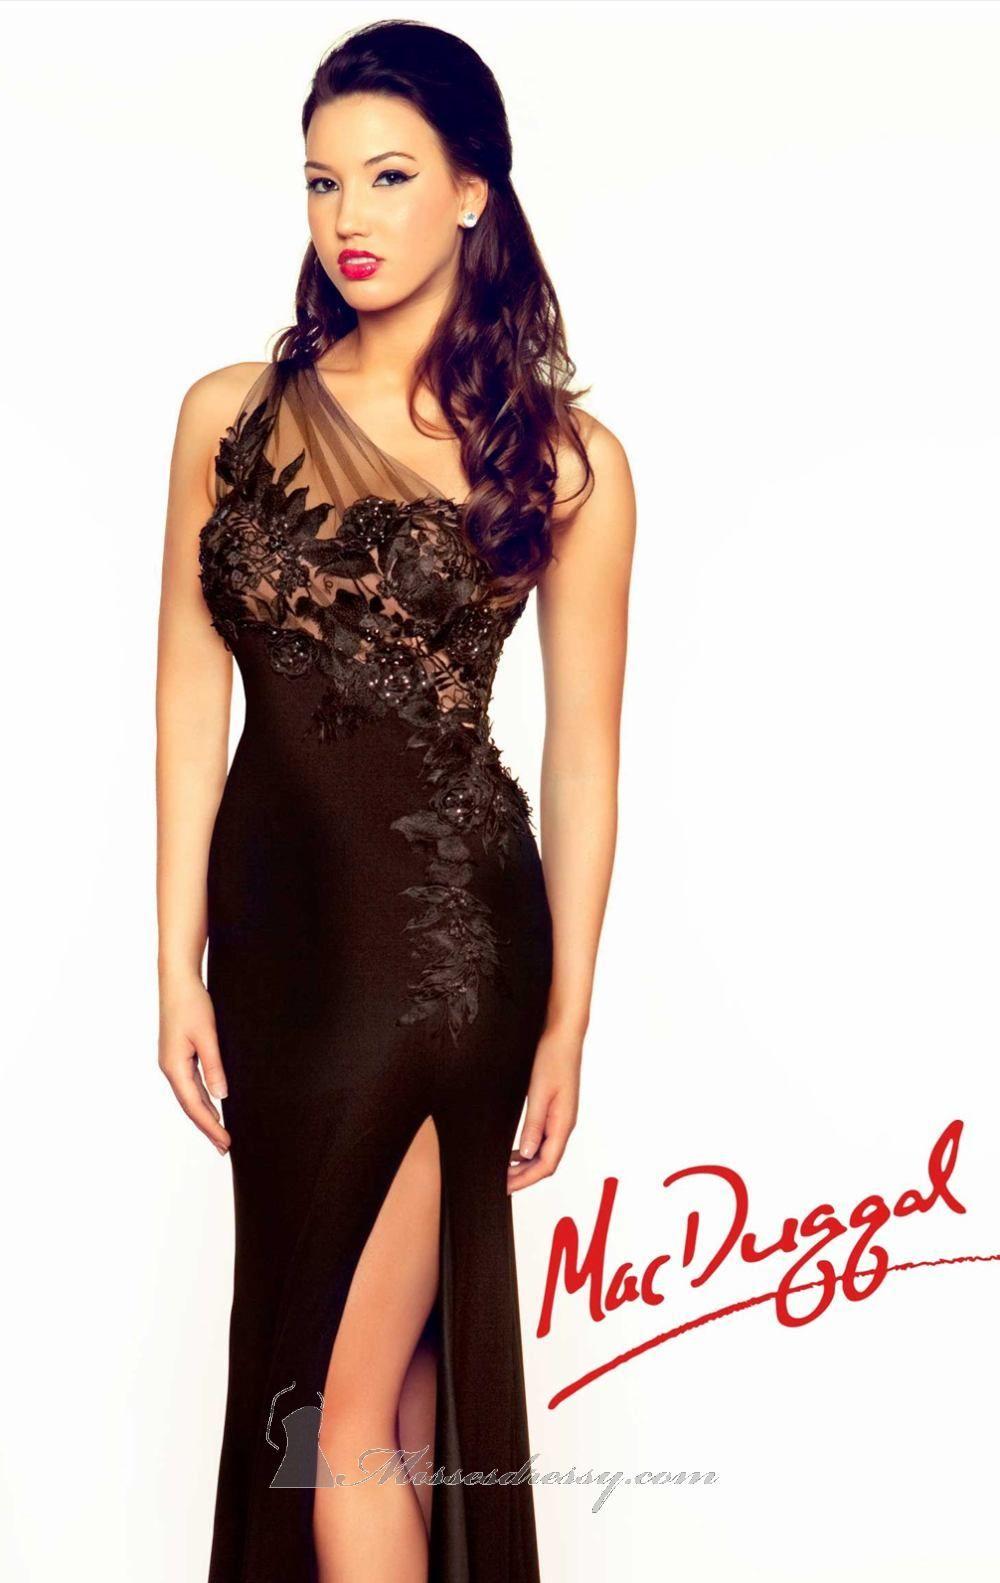 Mac duggal r by mac duggal black white red dream dresses